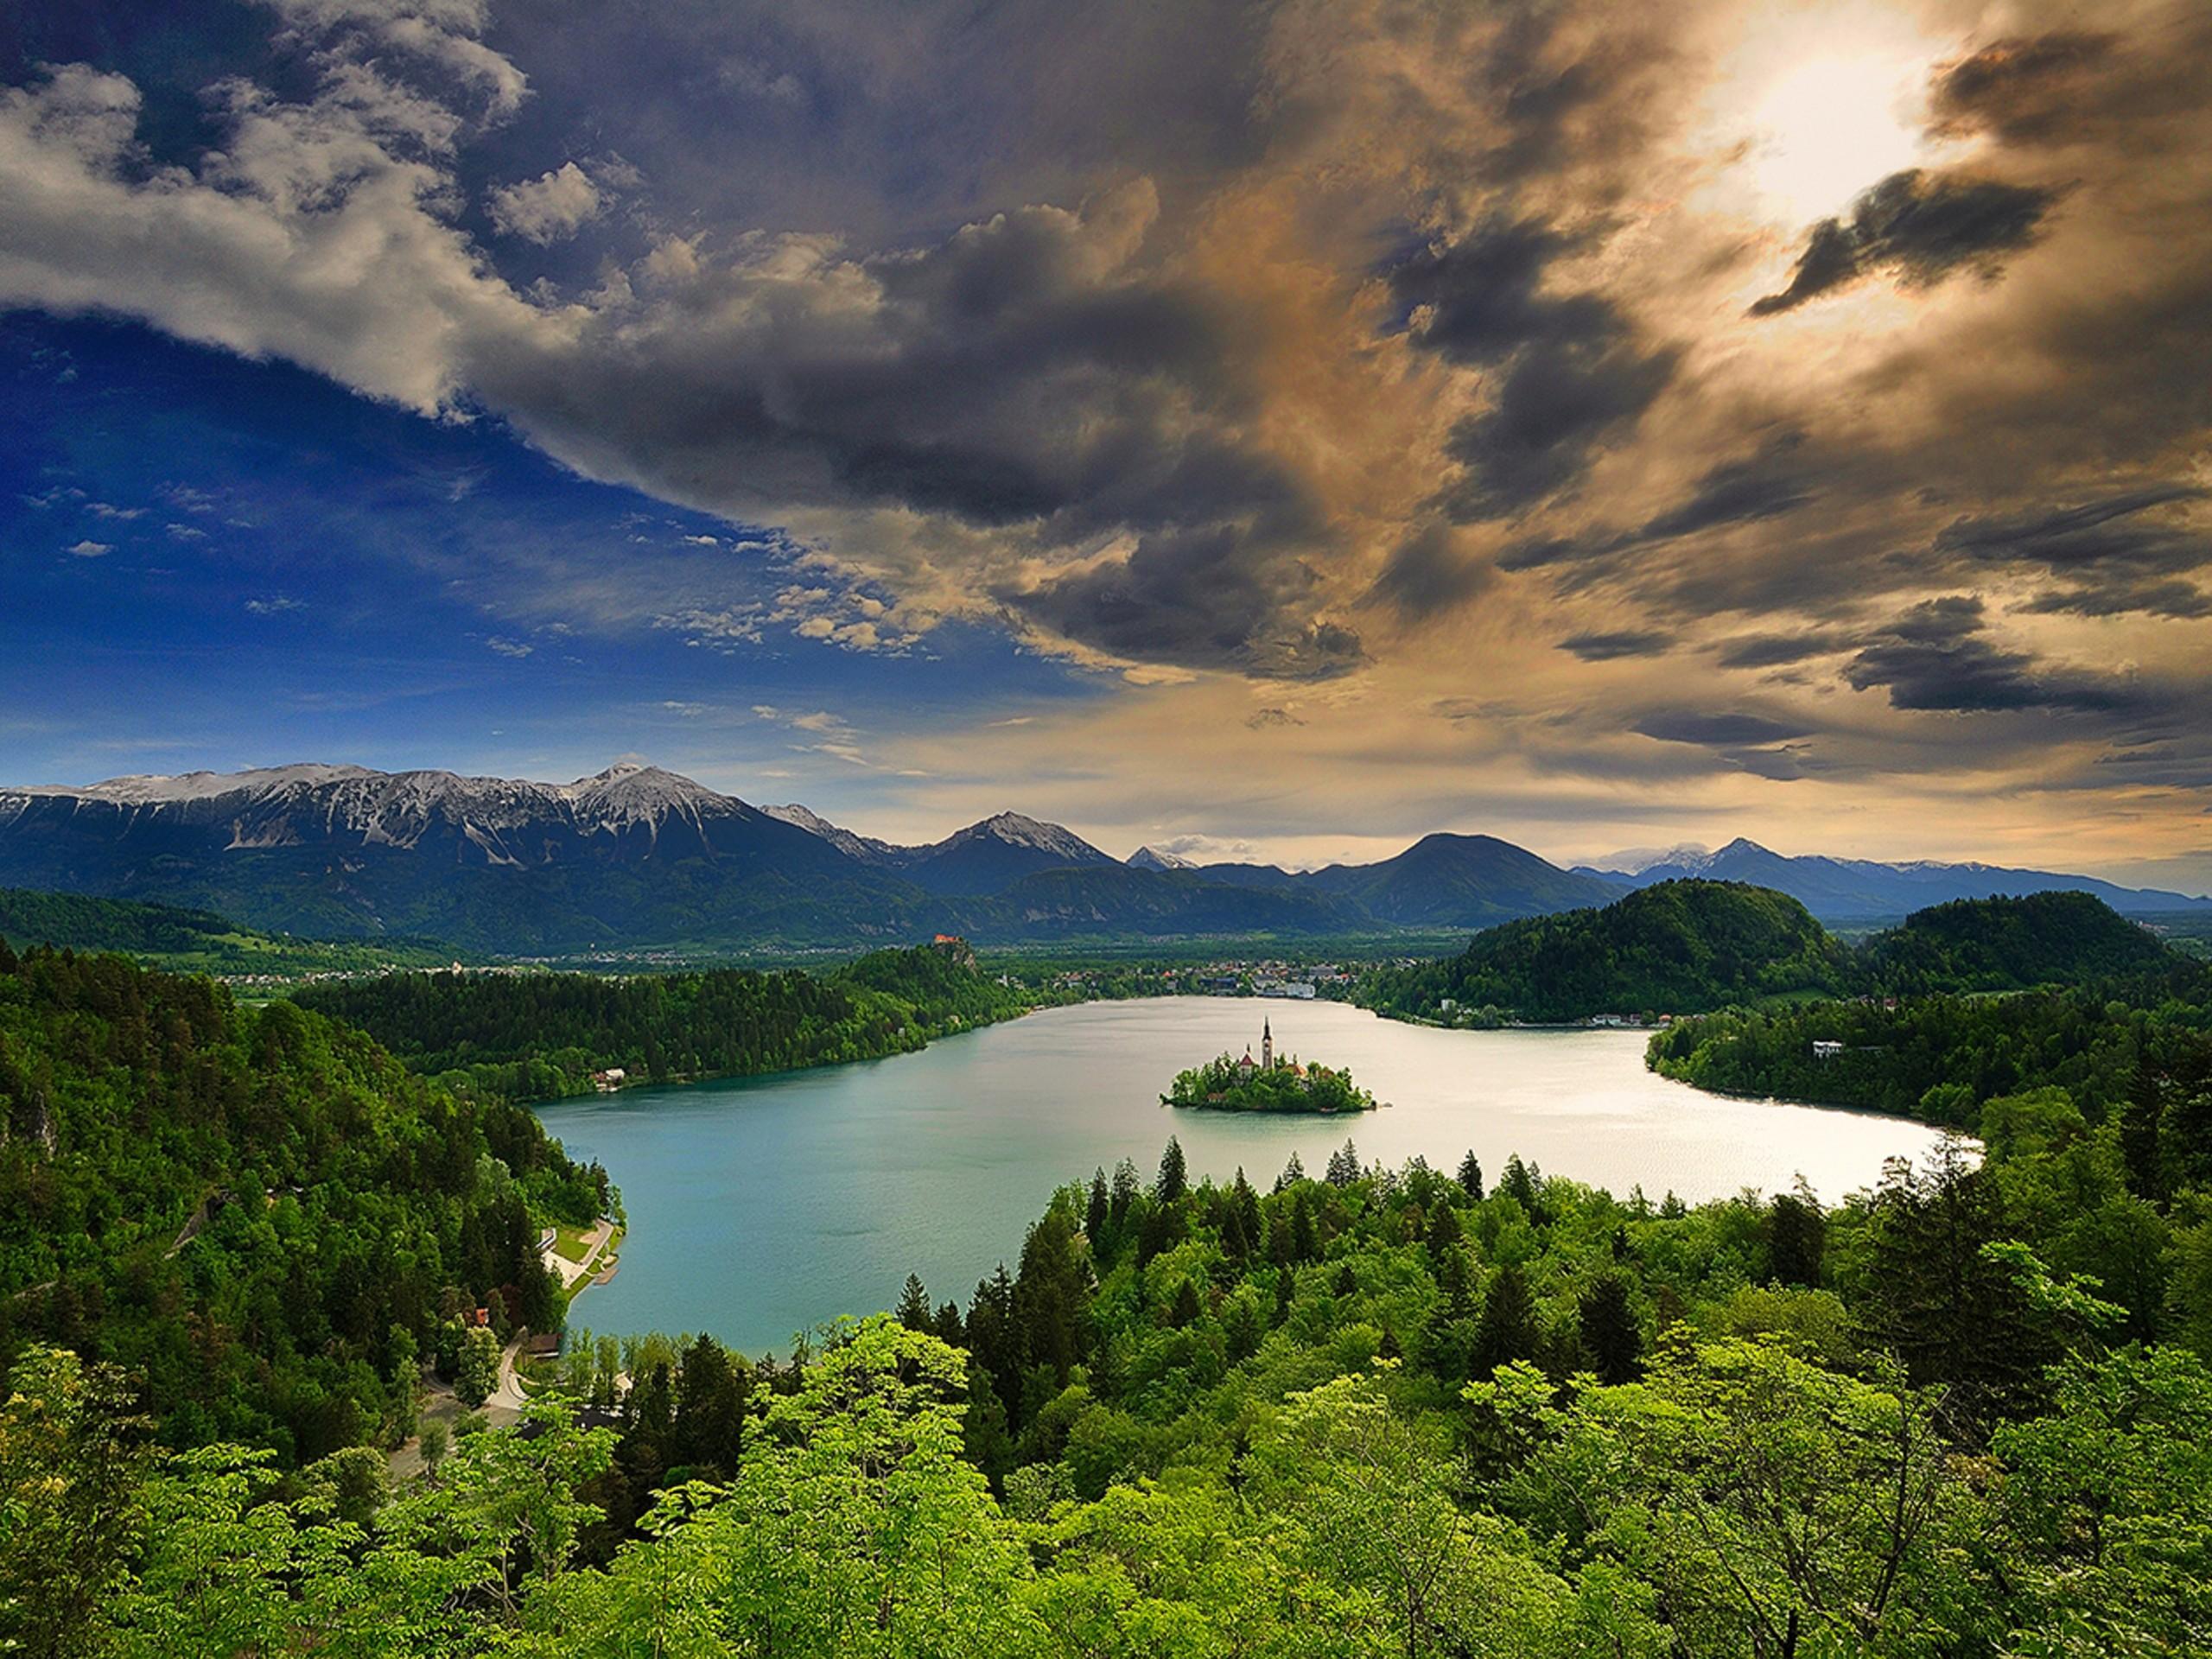 Sunset over Bled lake in Slovenia